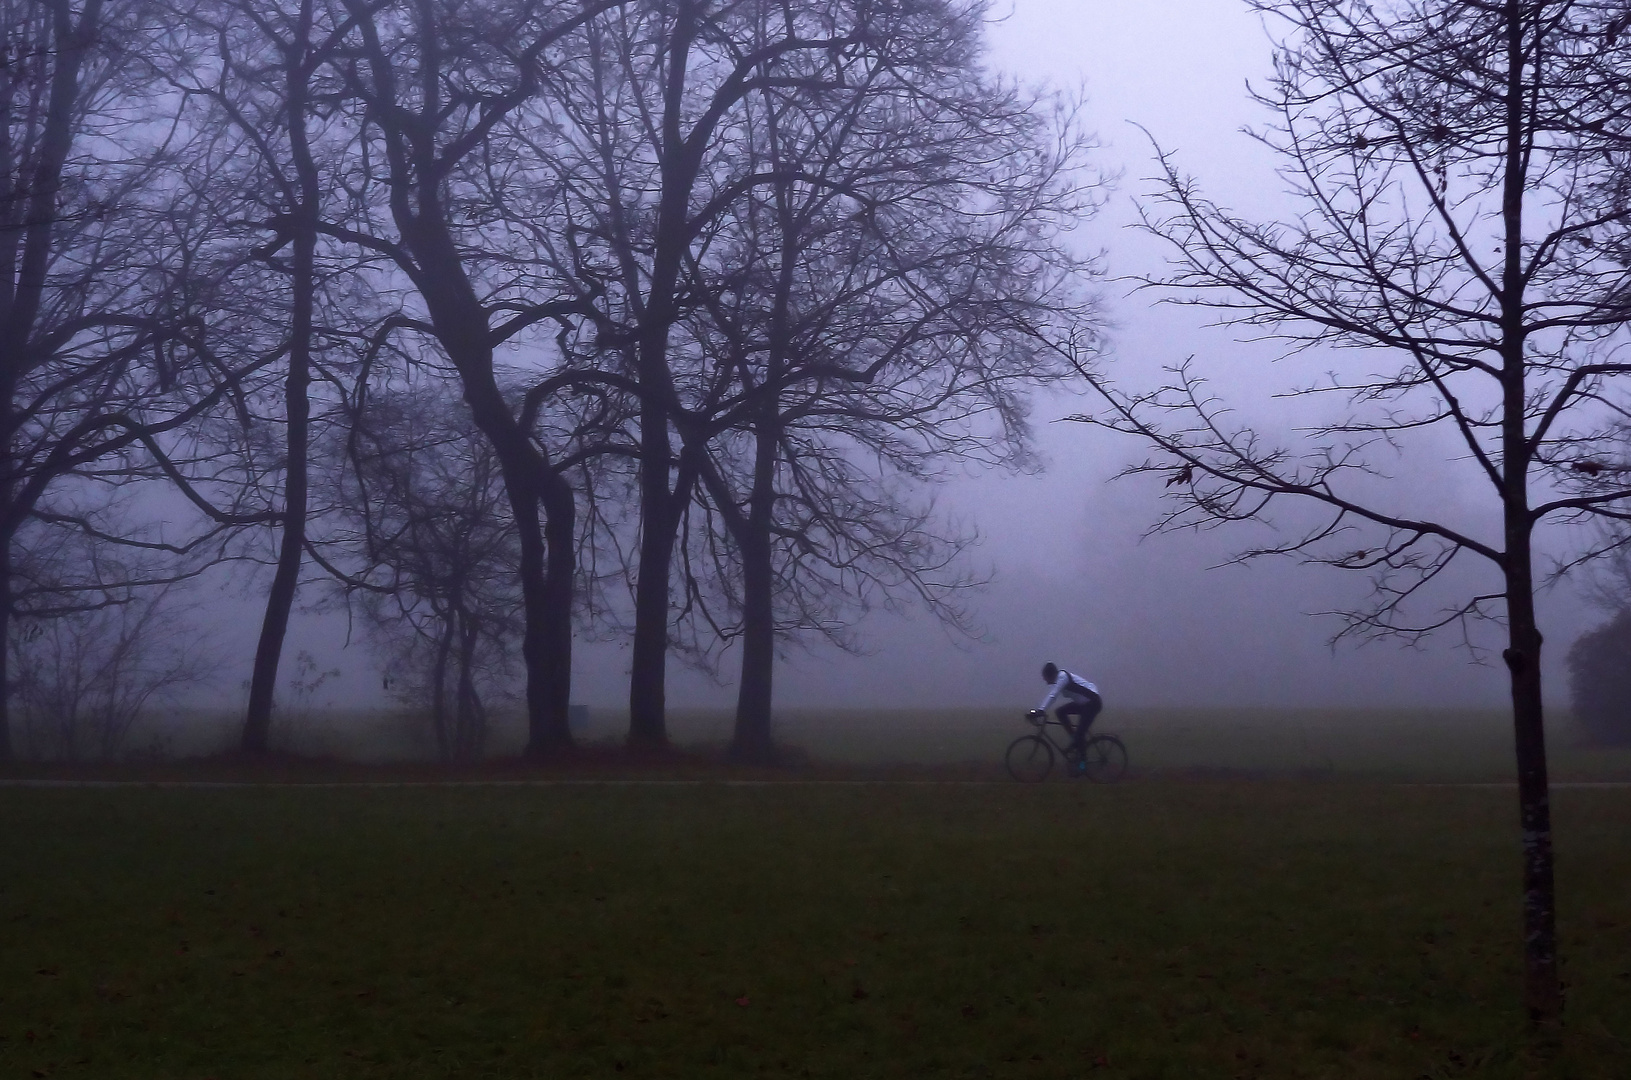 ob nebel oder nicht: bewegung muss sein!